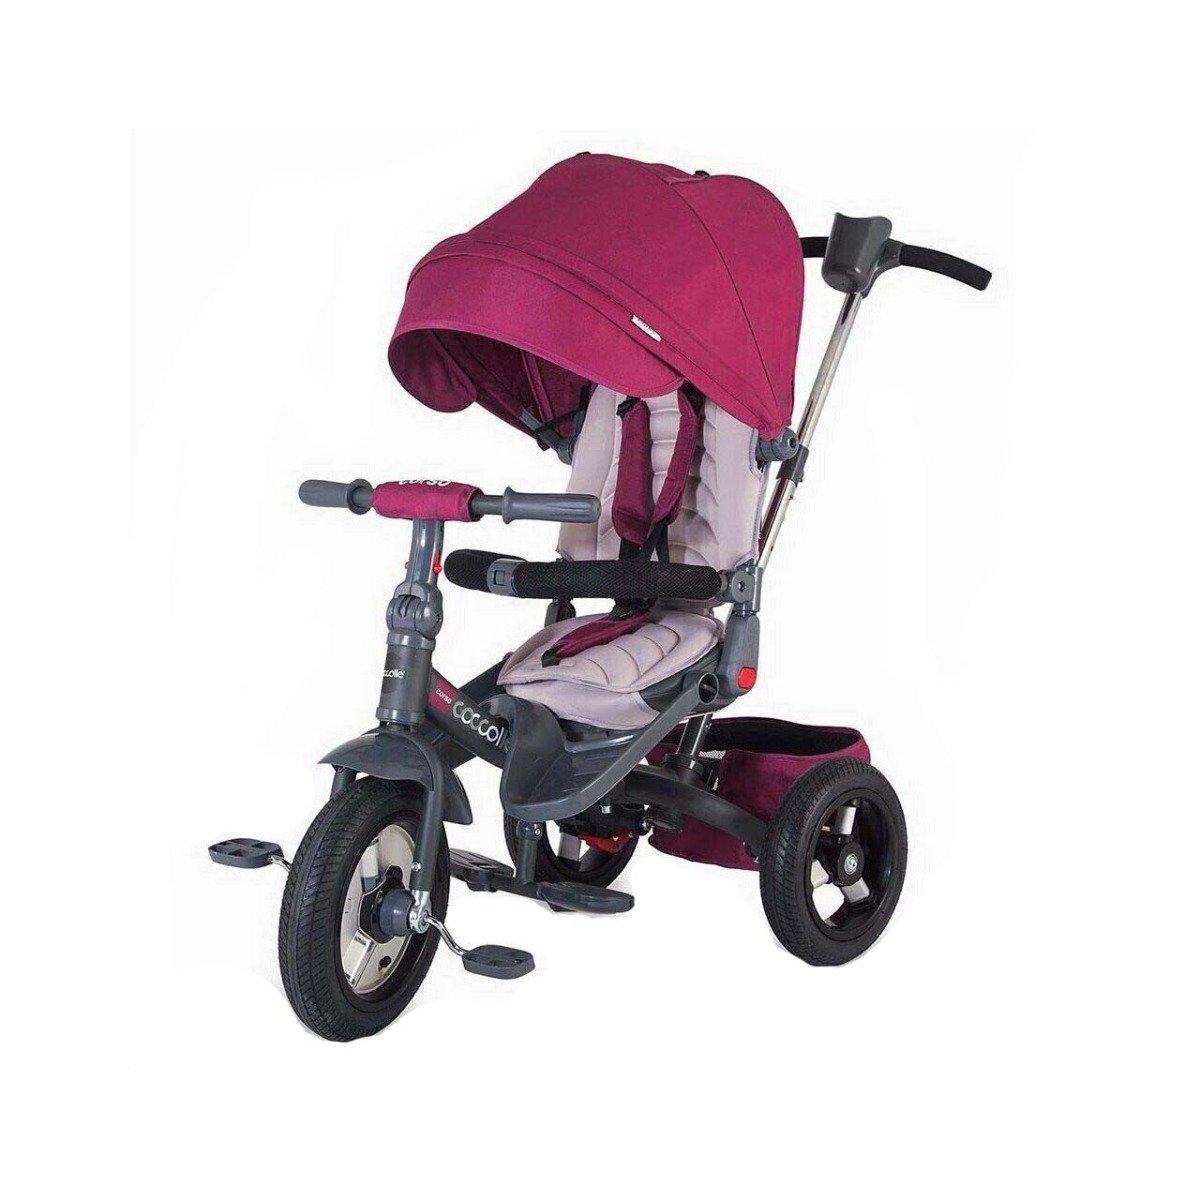 Tricicleta multifunctionala Corso Coccolle, Violet imagine